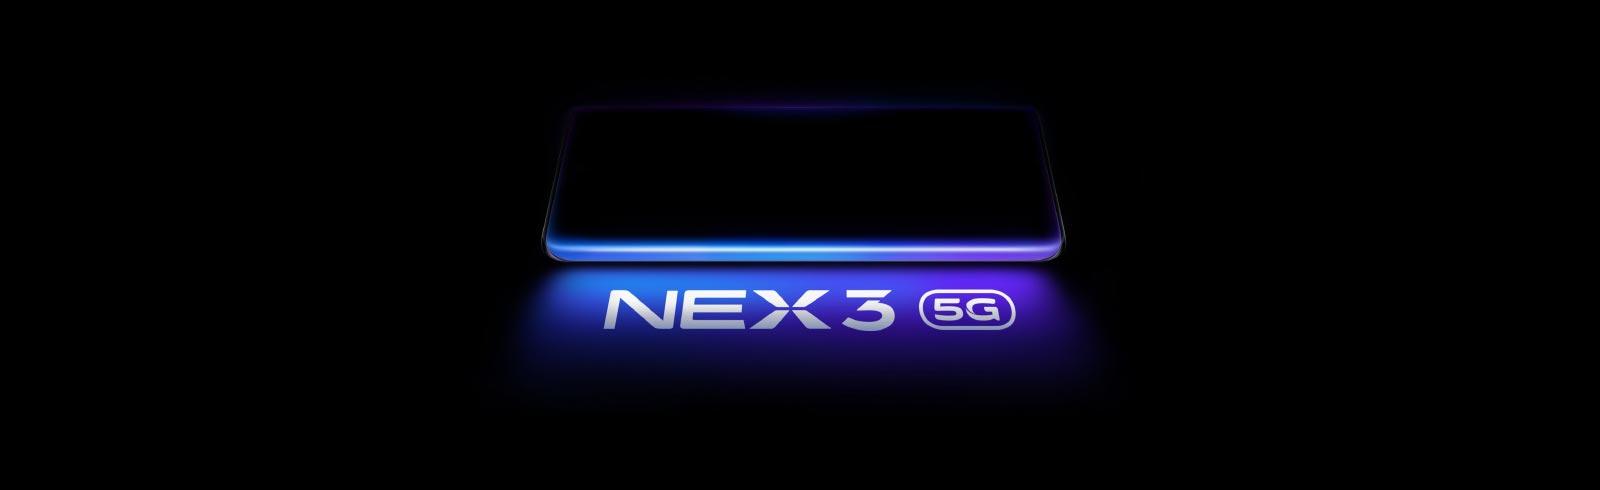 Vivo NEX 3 5G will be unveiled next month